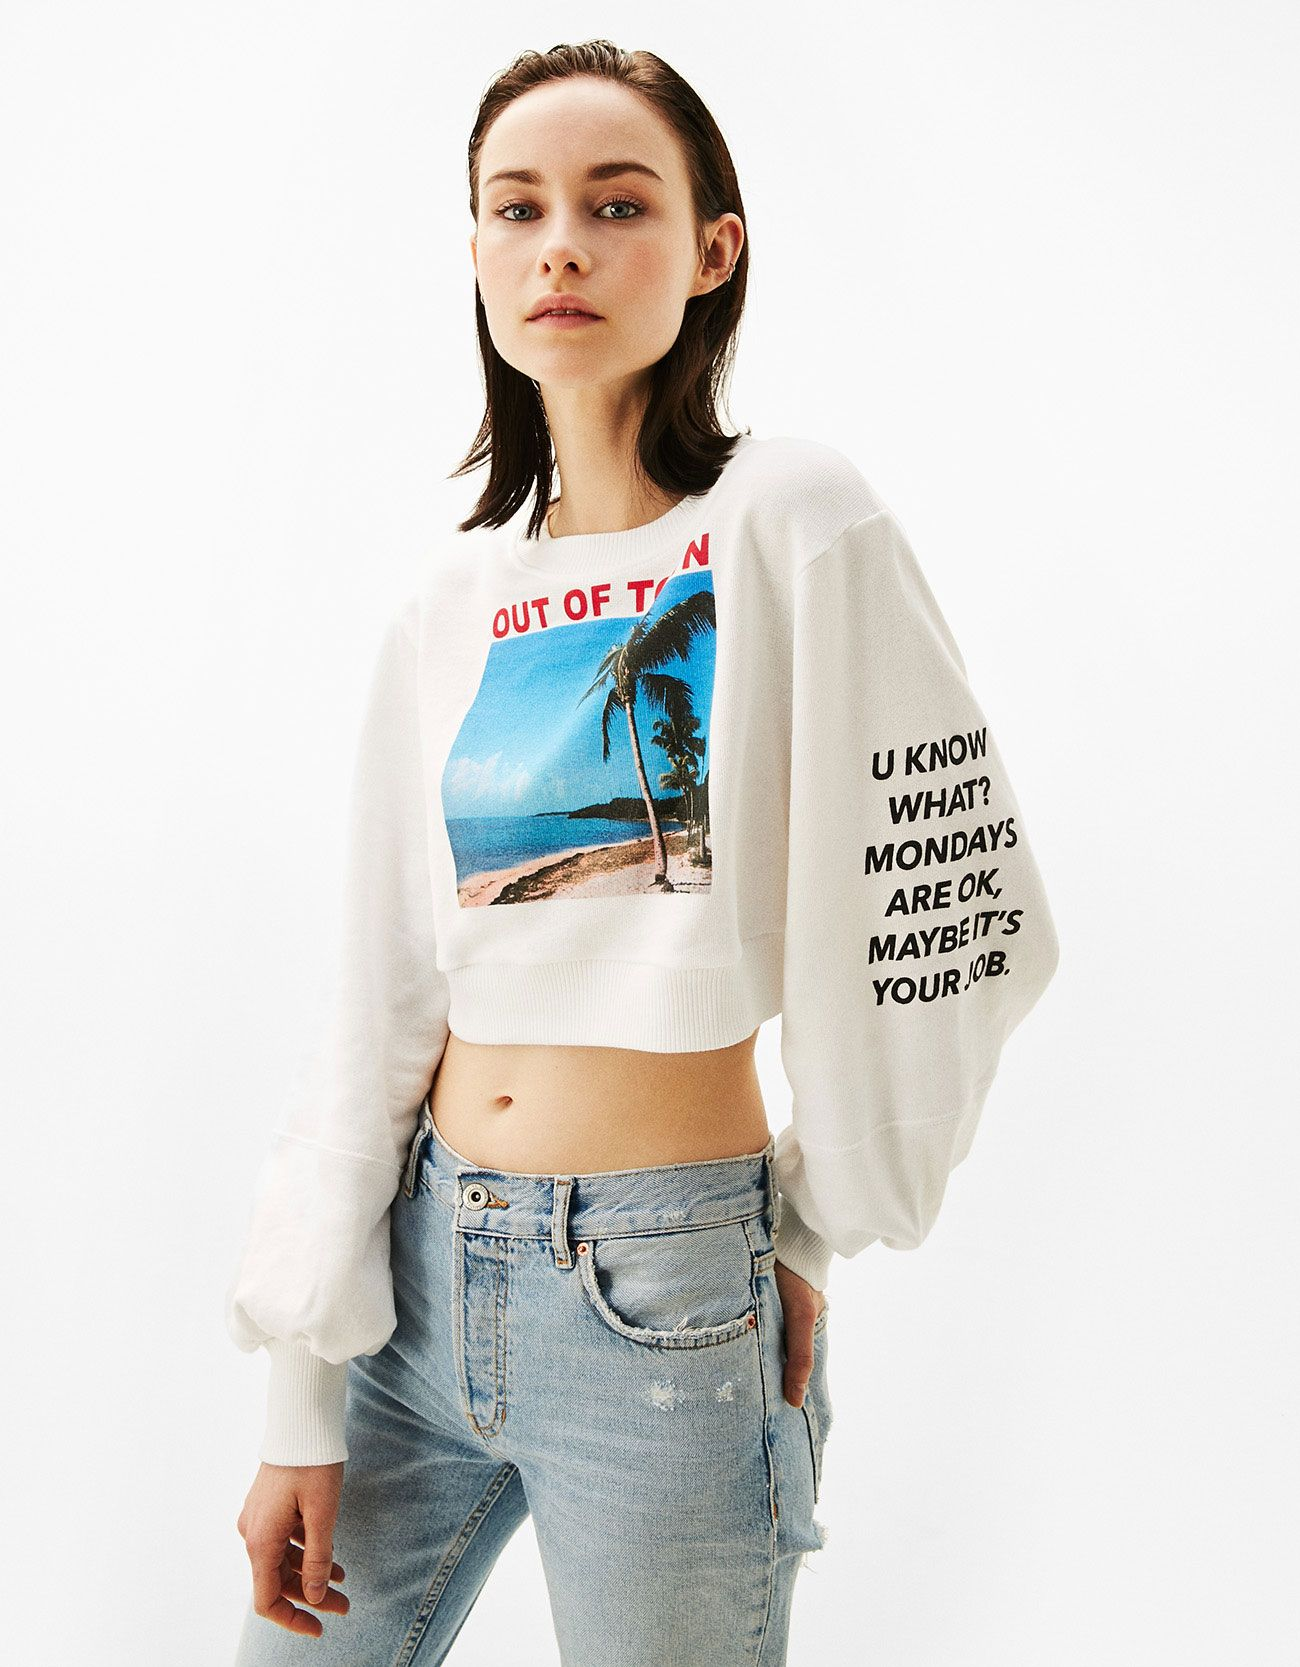 aa3fa7ef24 Printed cropped sweatshirt with full sleeves. - Sweatshirts - Bershka  United Kingdom